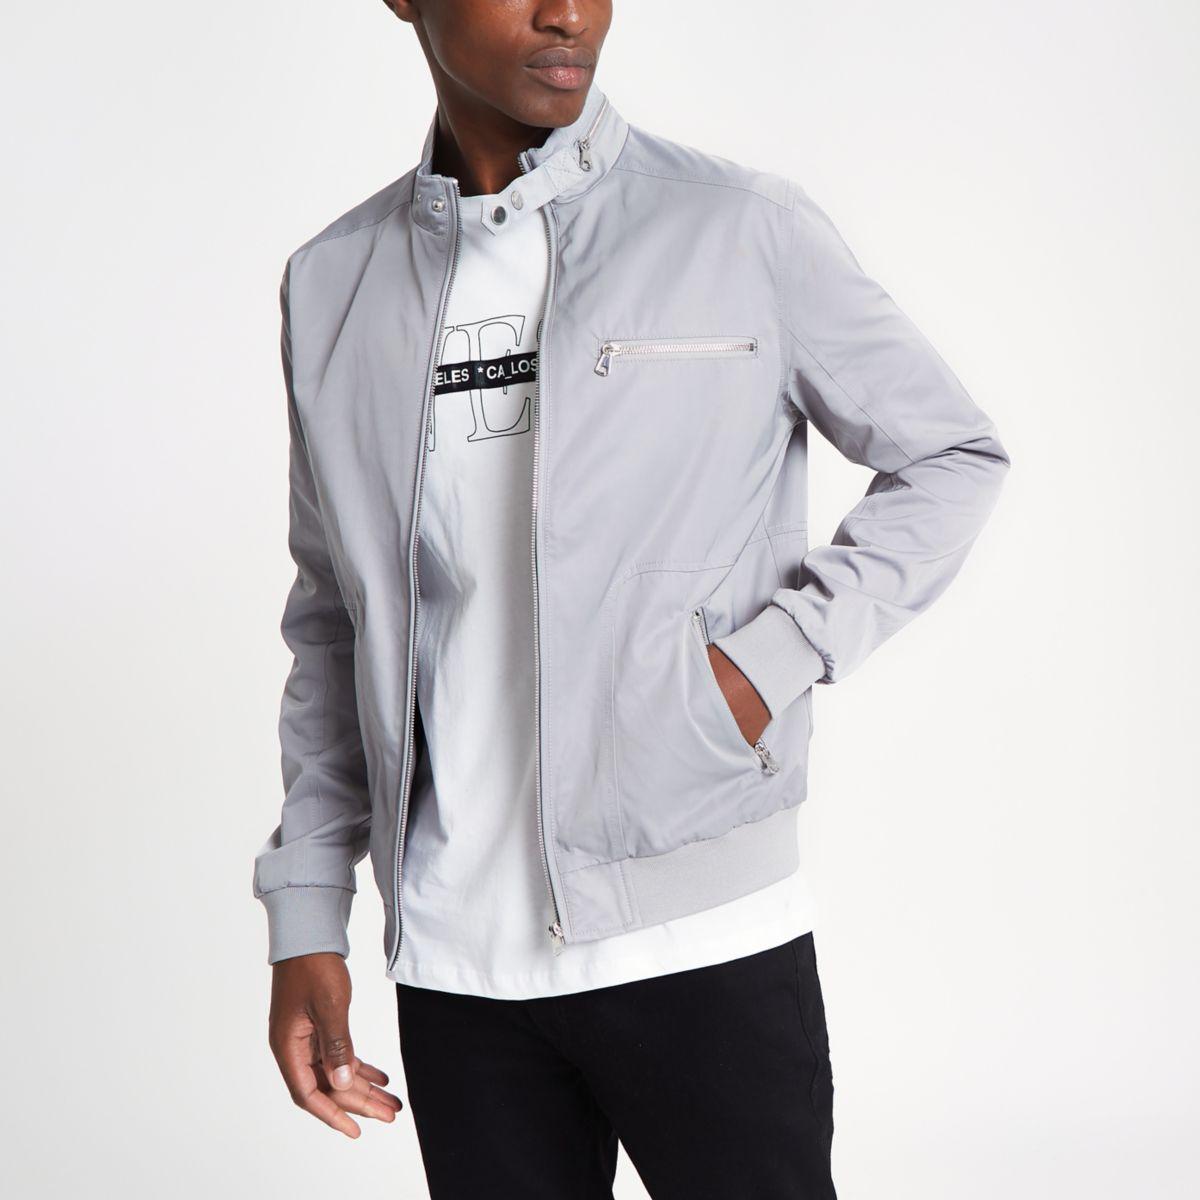 Grey racer neck jacket